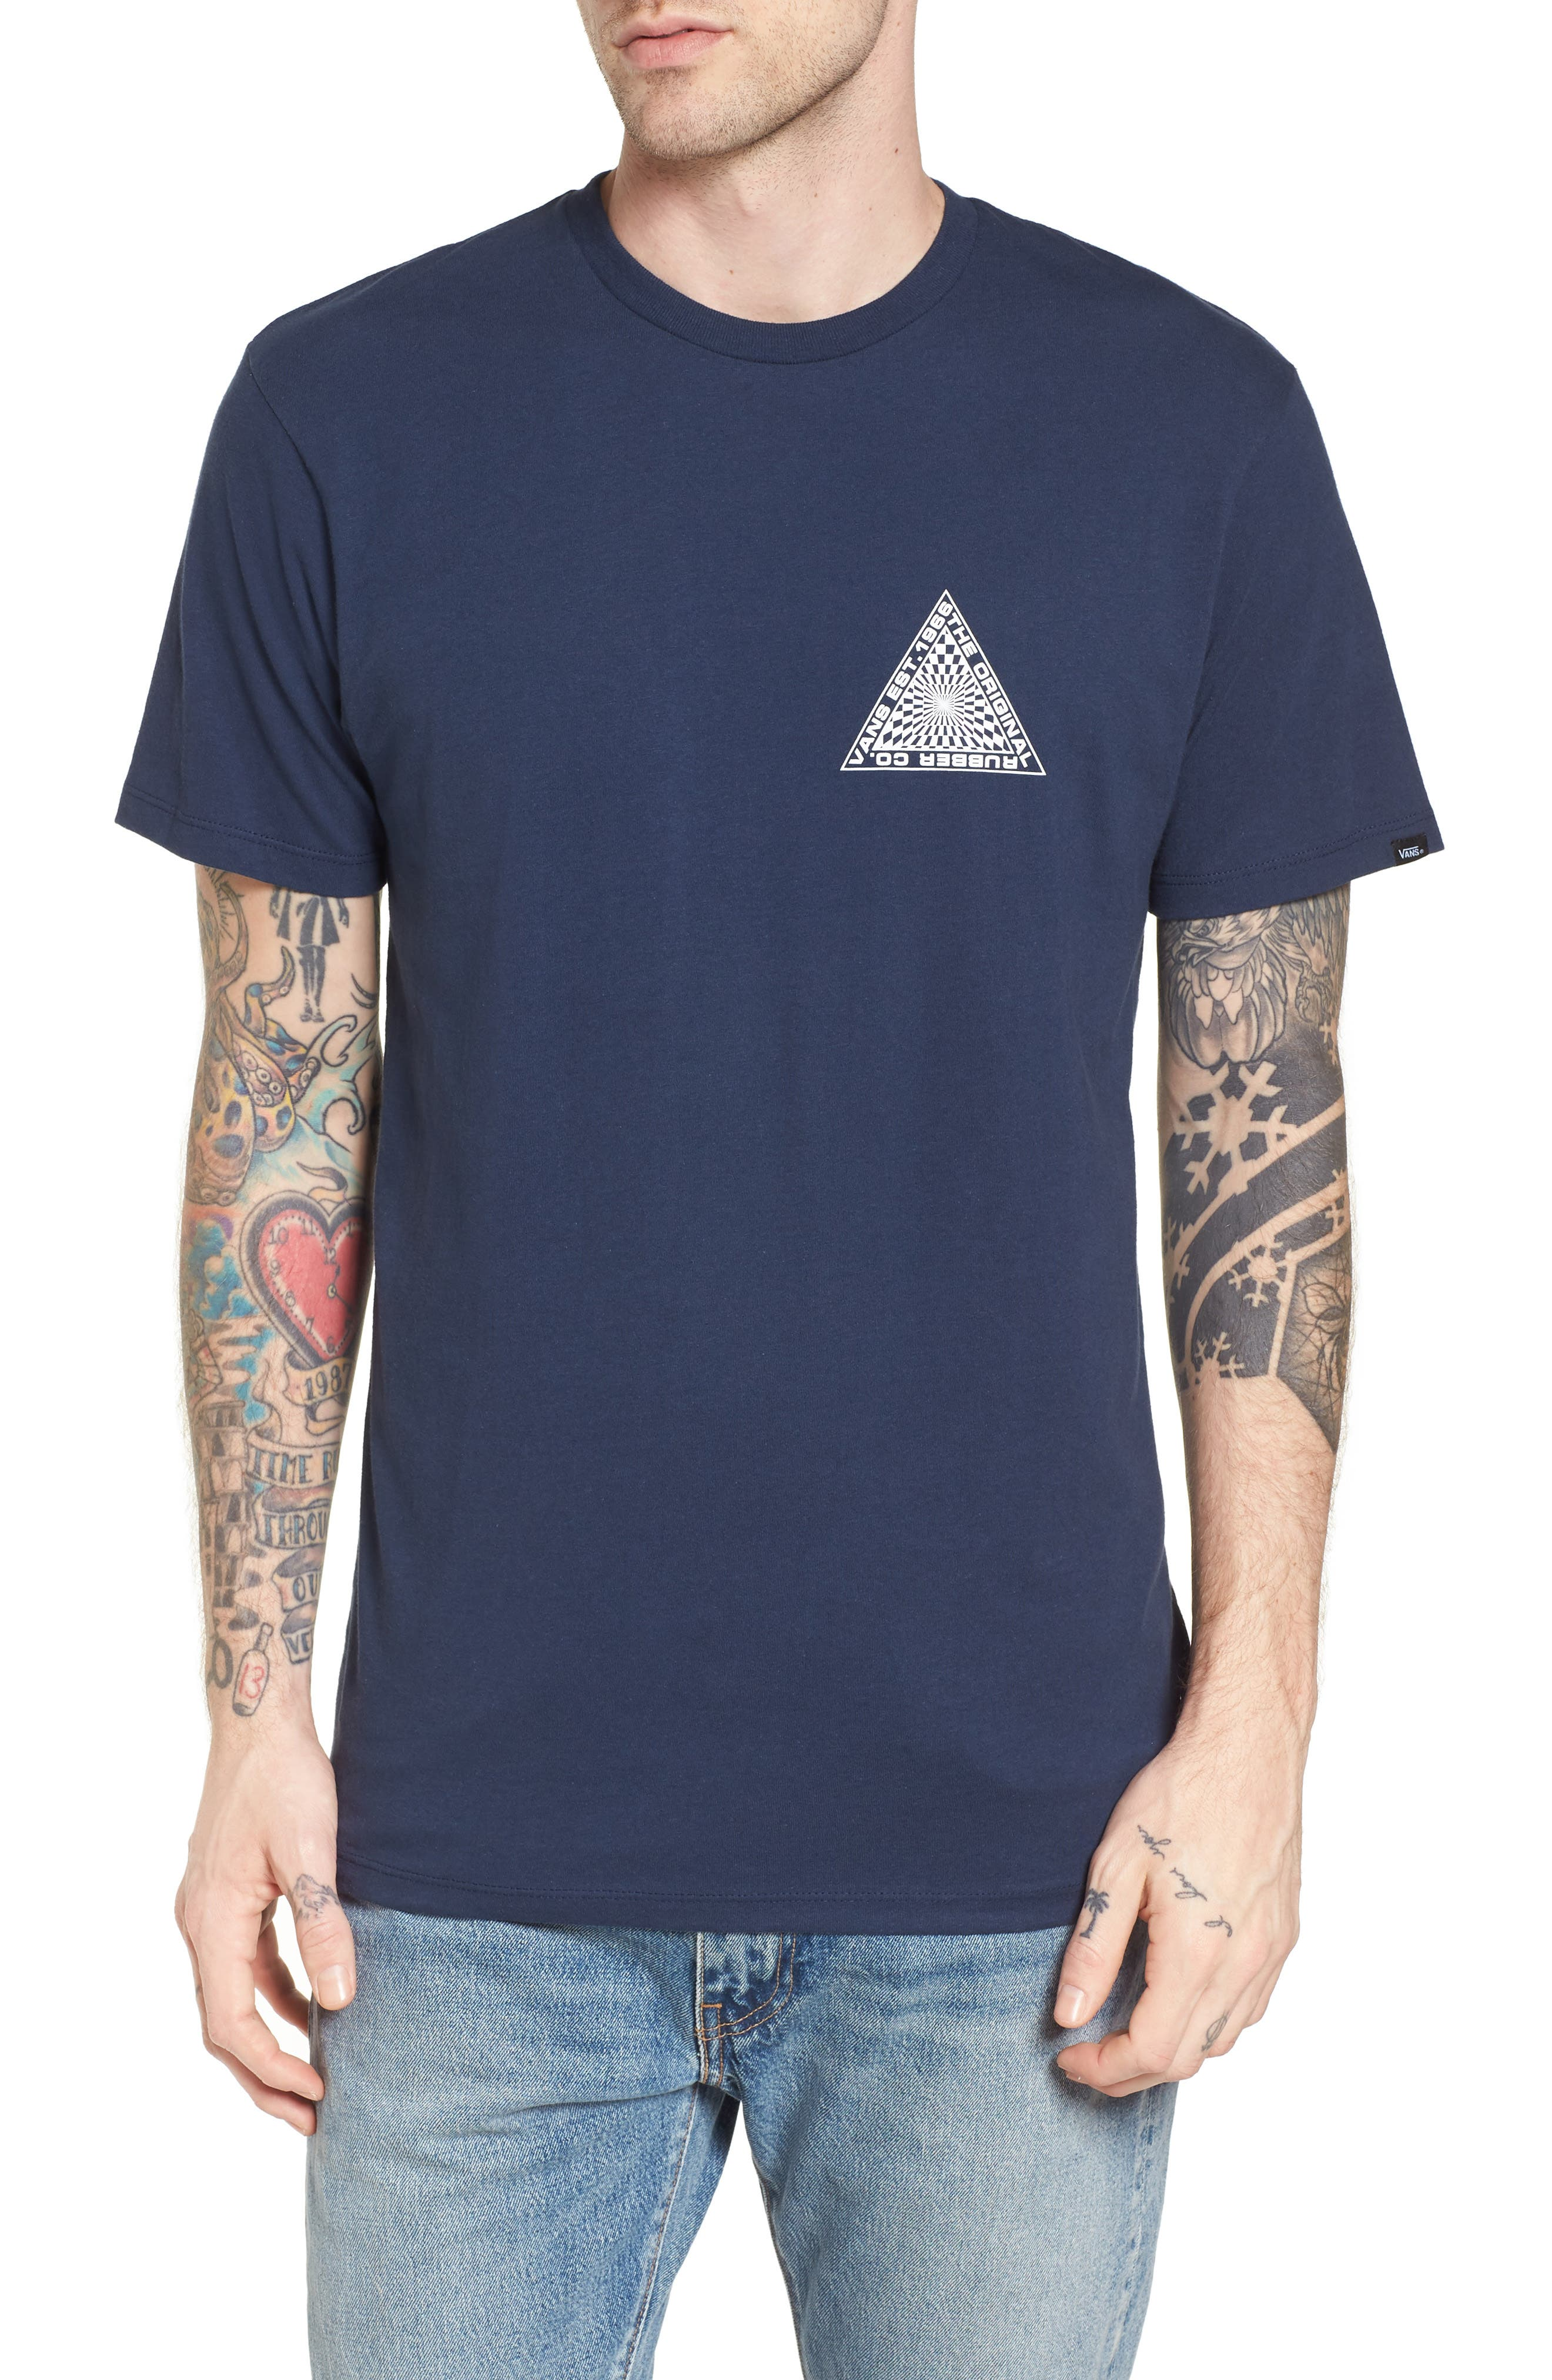 Alternate Image 1 Selected - Vans Hypnotics T-Shirt